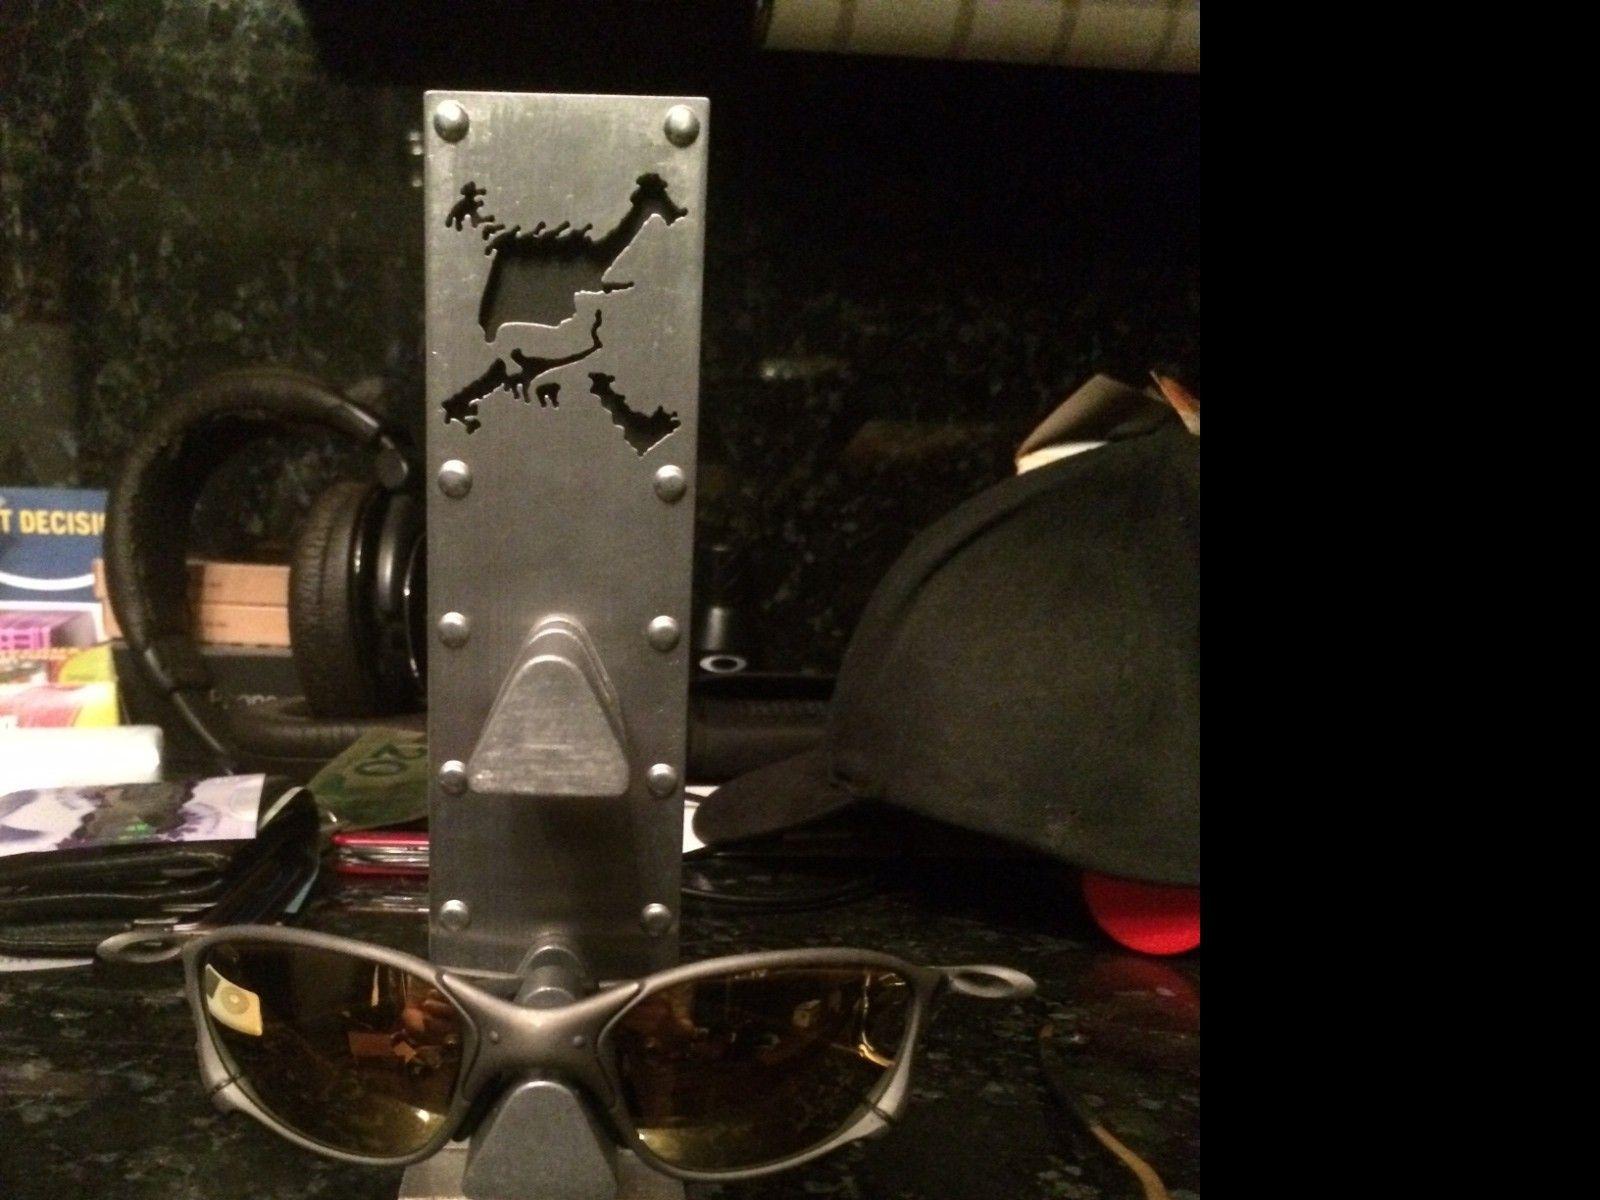 Oakley Stand Skull Metal - zt6mgg.jpg